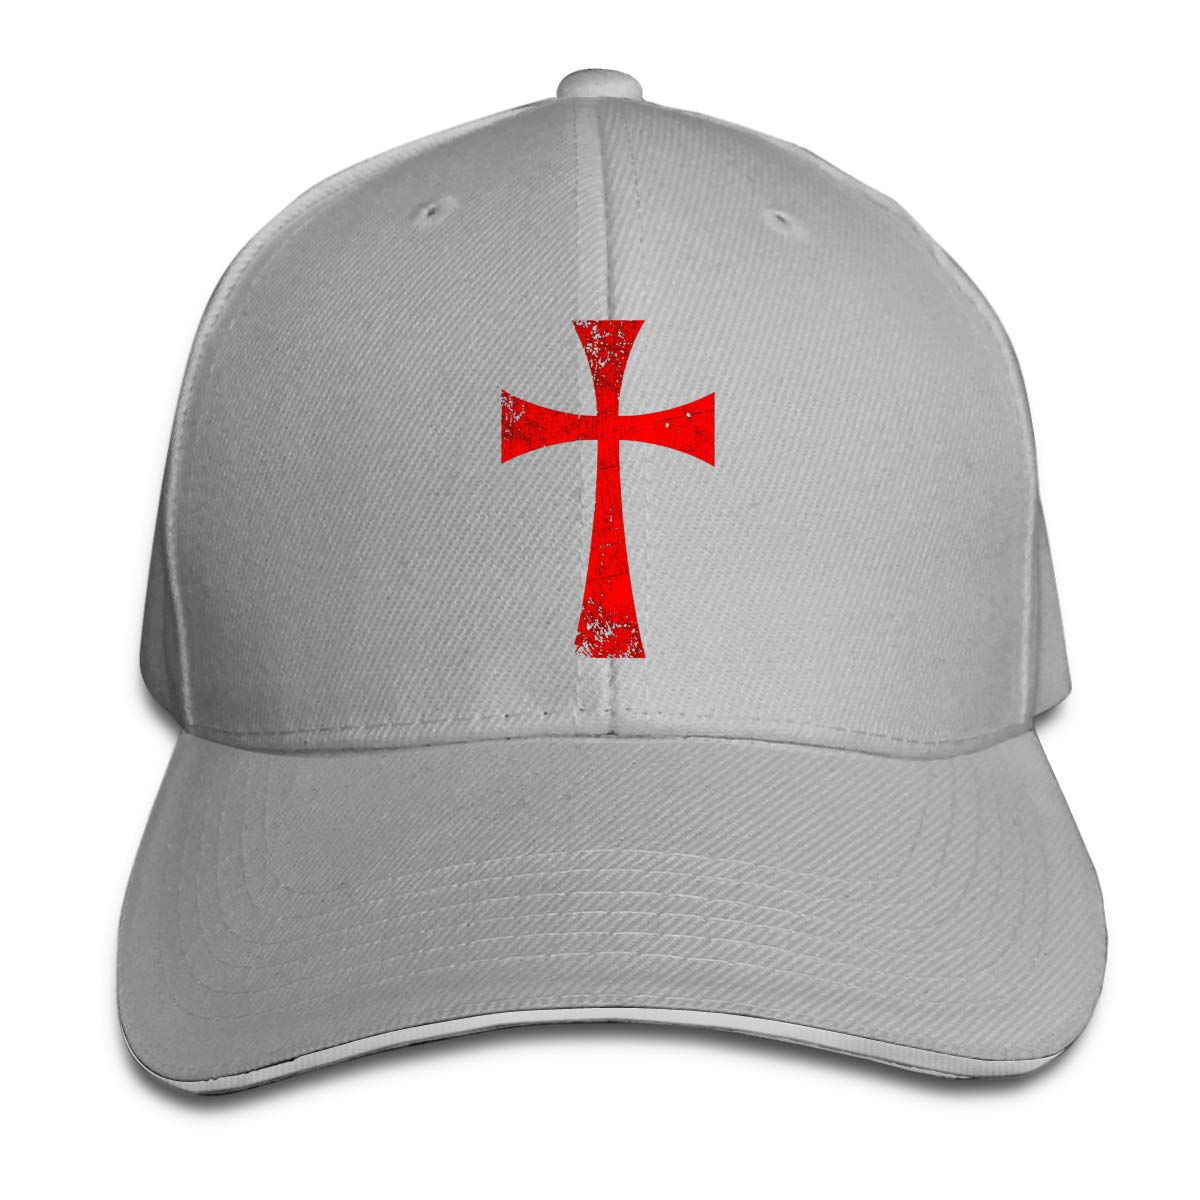 Knights Templar Crusader Cross1 Unisex Adult Baseball Caps Adjustable Sandwich Caps Jeans Caps Adjustable Denim Trucker Cap